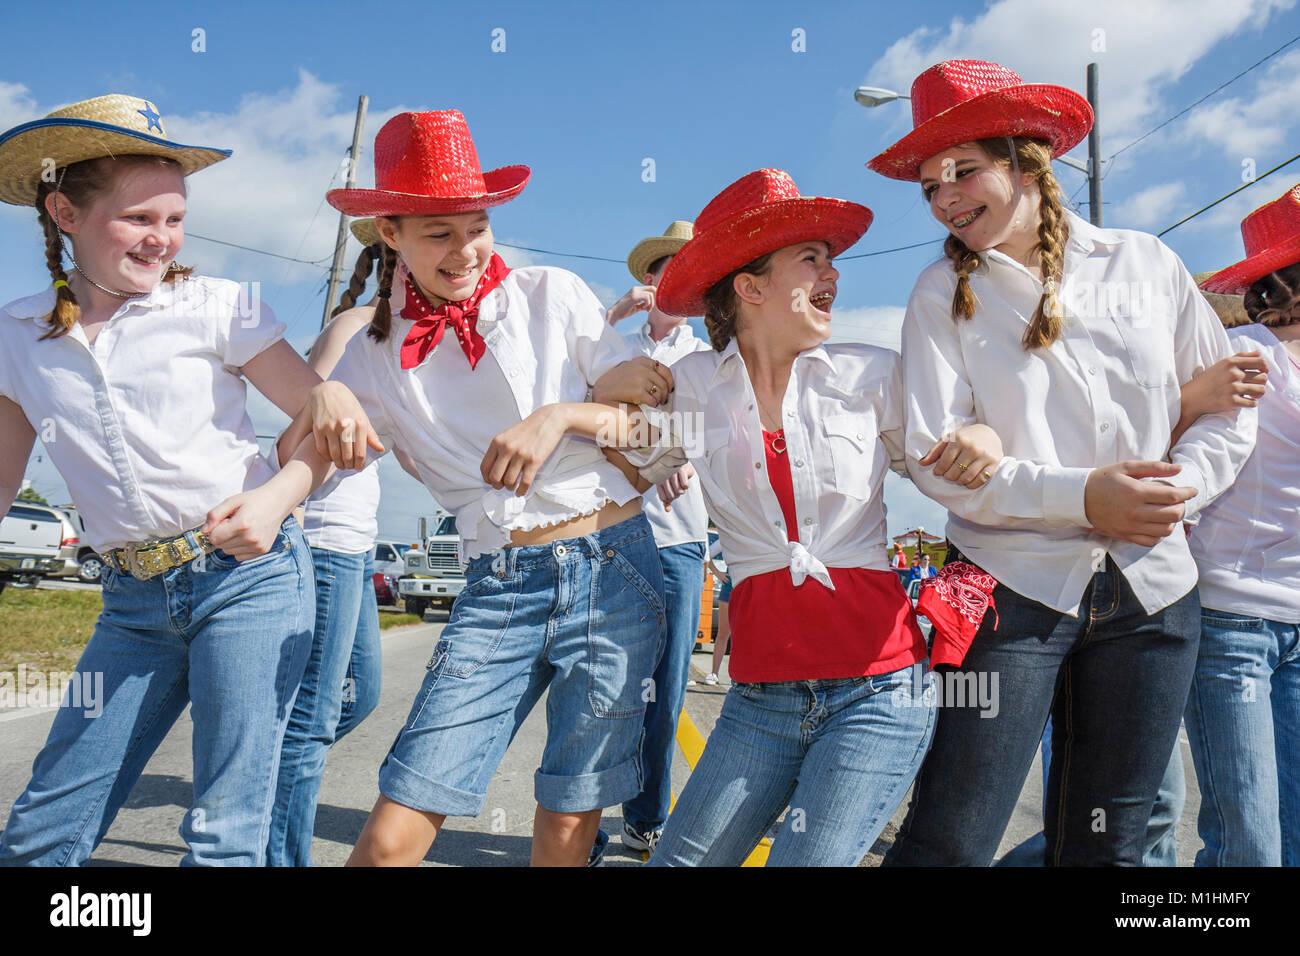 Child Cowboy Hat Deputy Sheriff Costume Accessory Straw Wild West Old Western